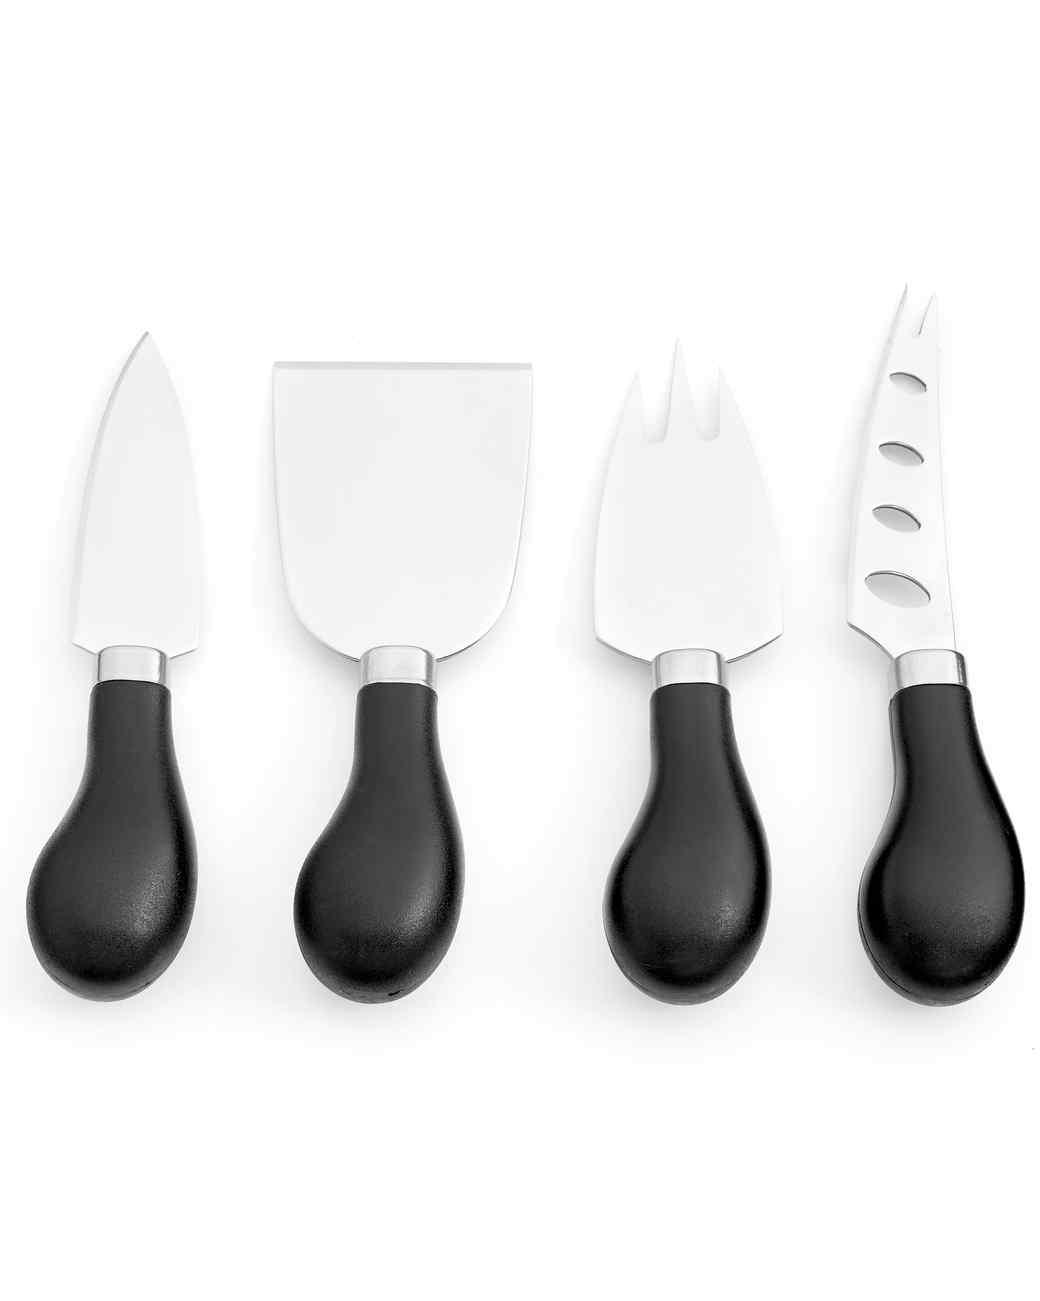 msmacys-cheeseknives-retail-0814.jpg